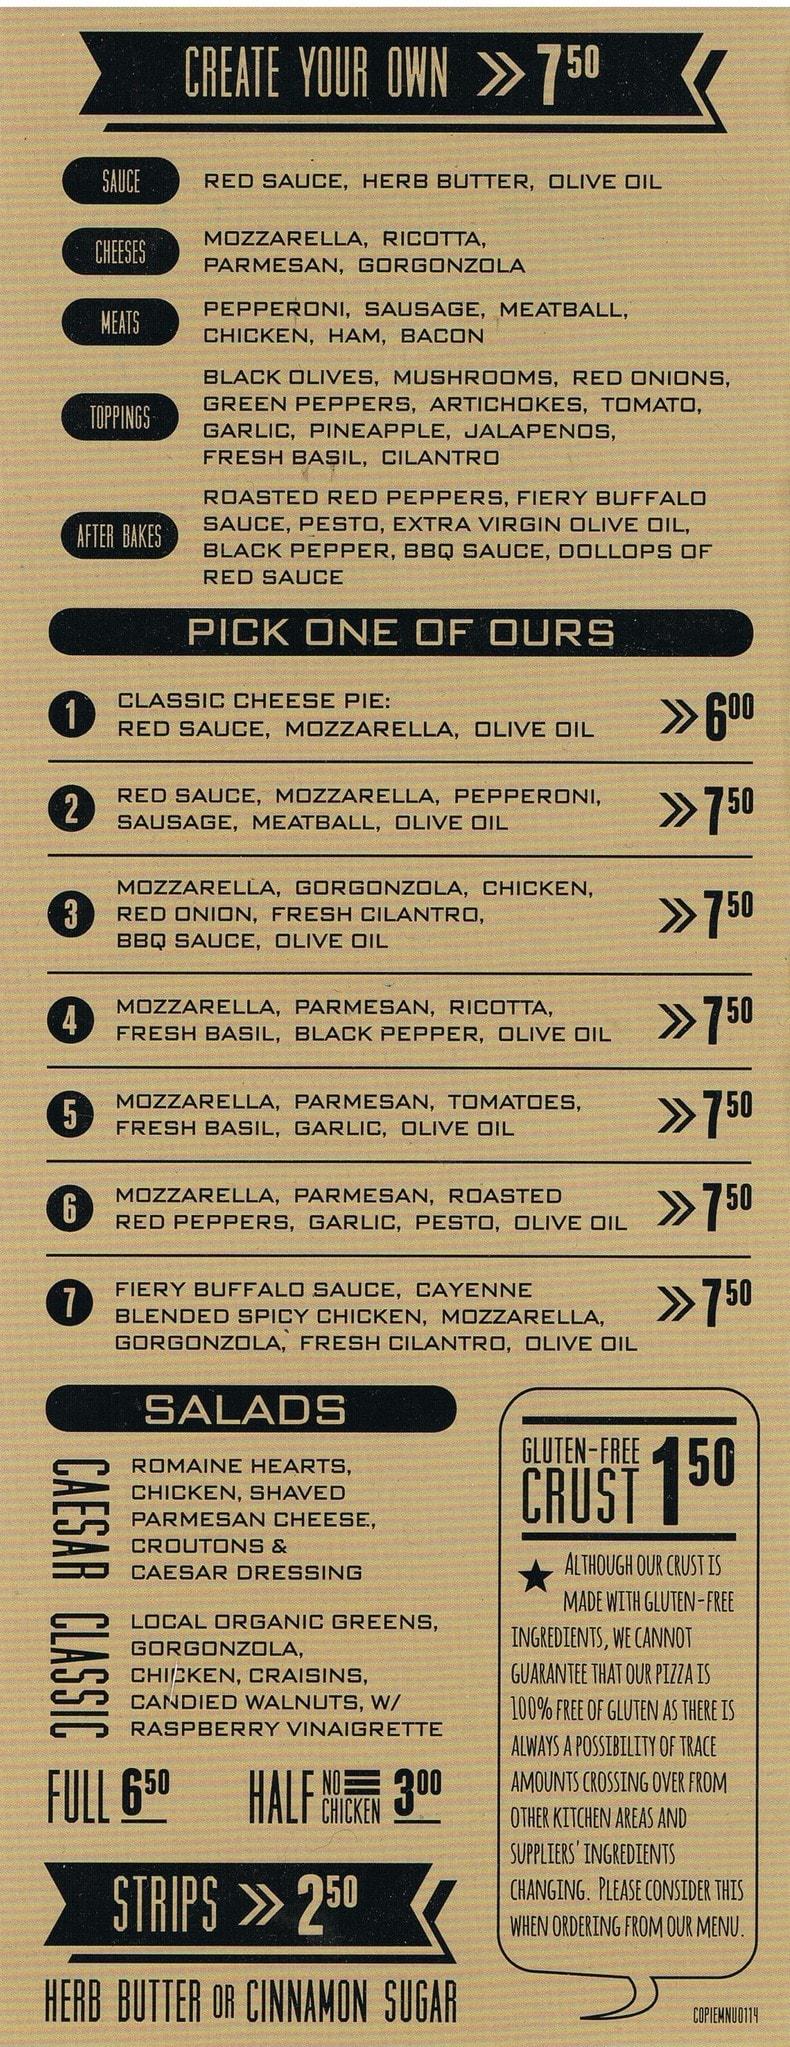 Blackjack pizza locations lakewood